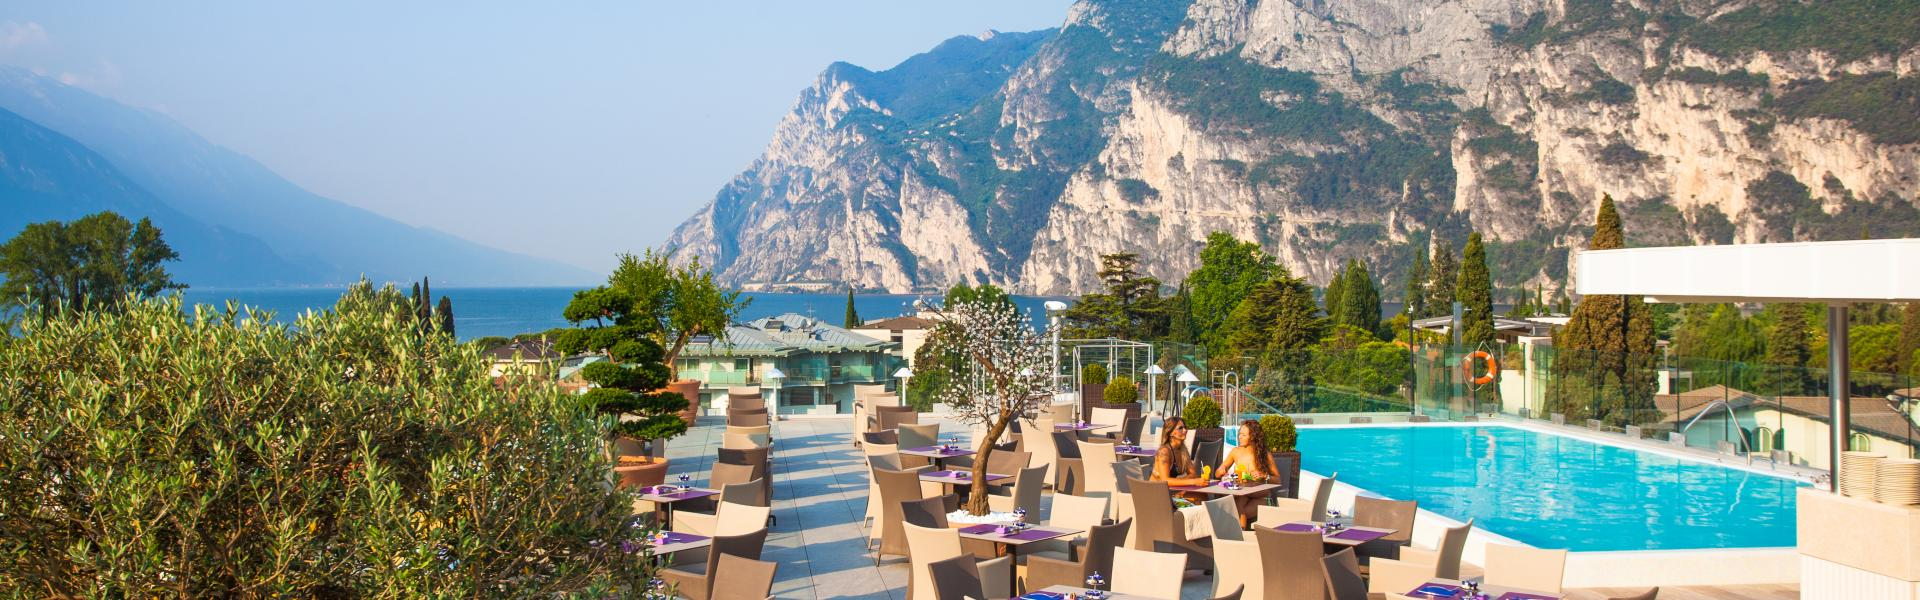 Hotel Kristal Palace 4 Sterne Superior Riva Del Garda Gardasee